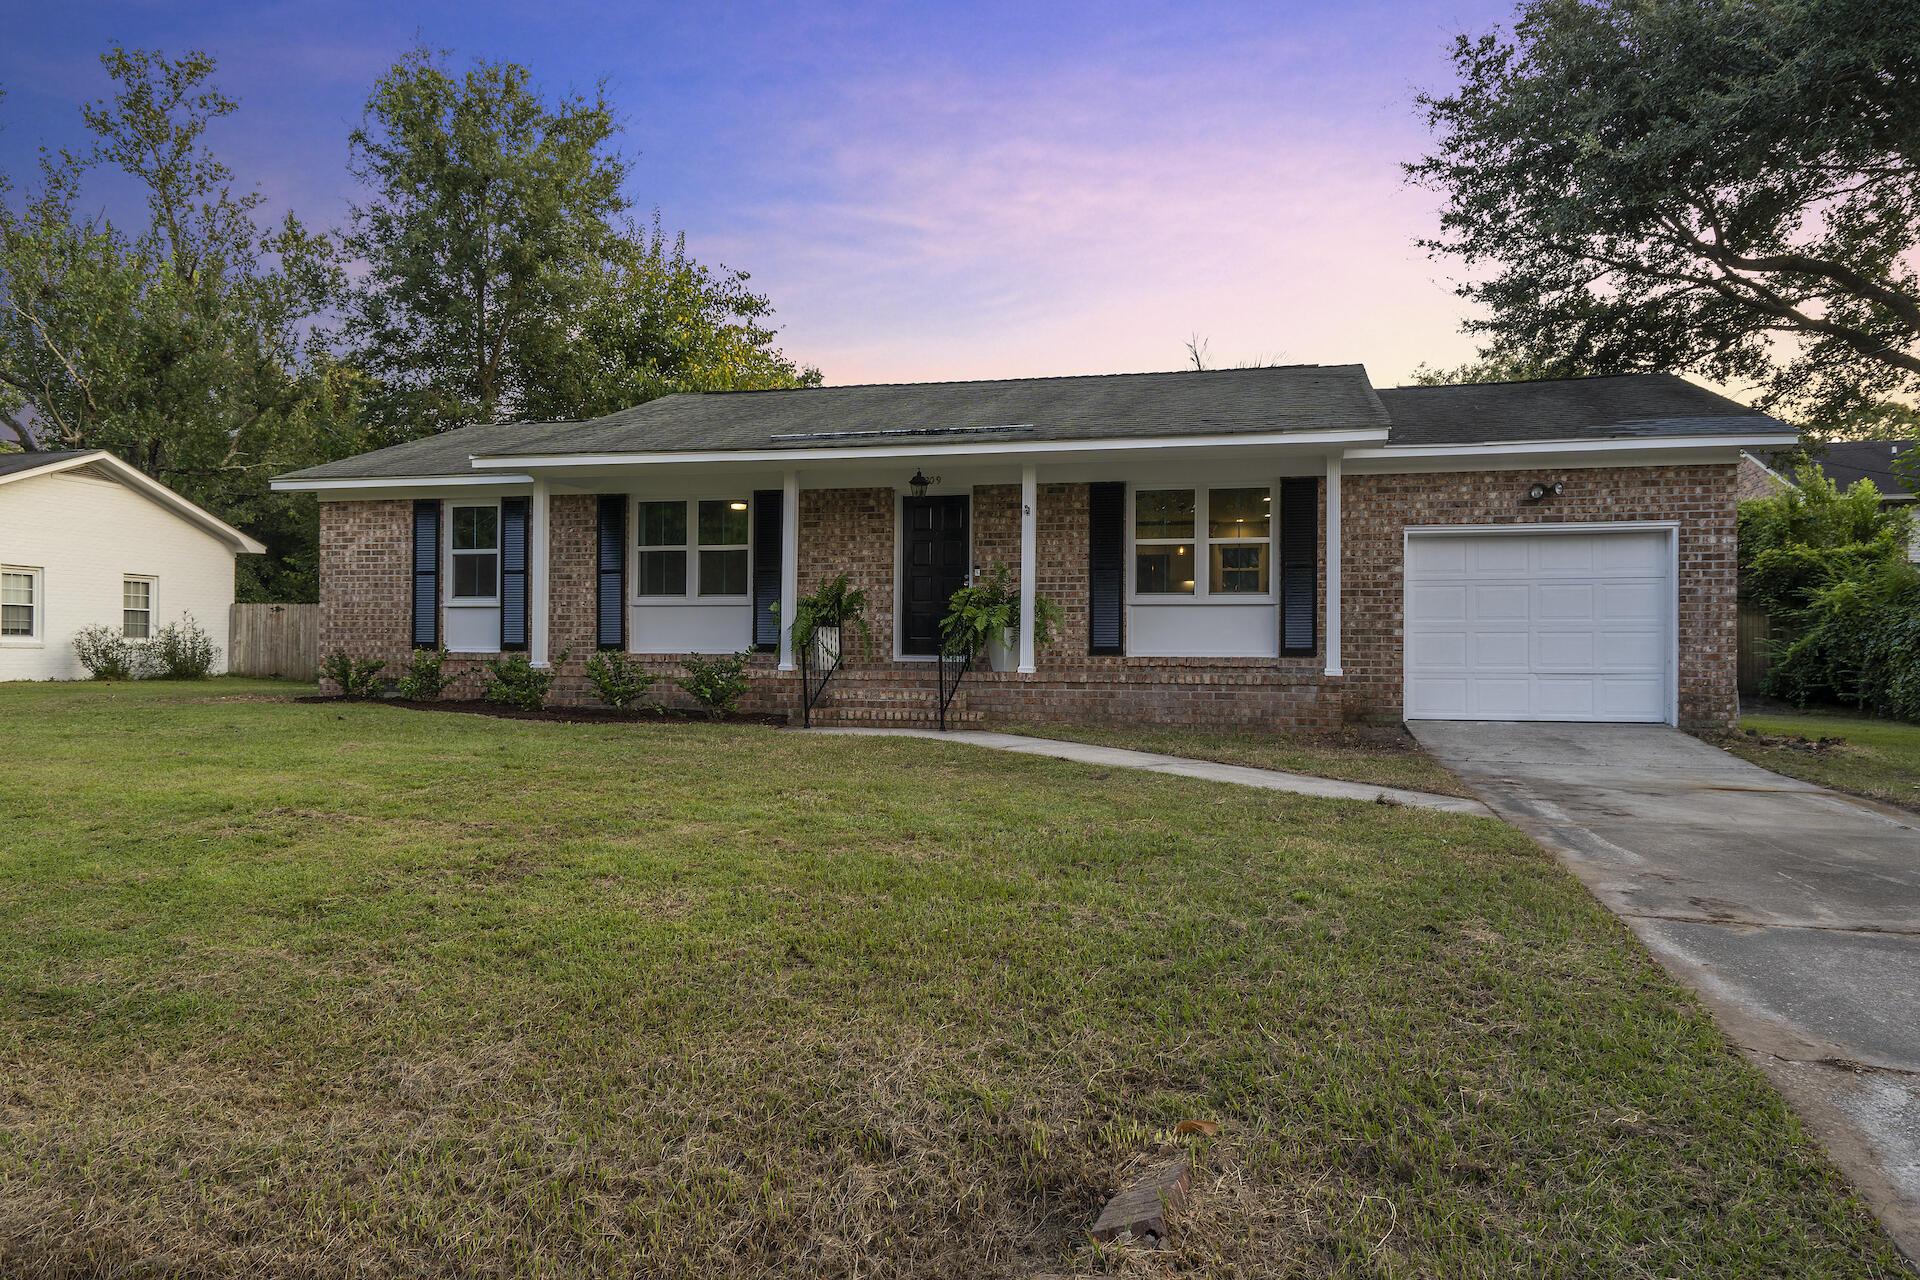 Whitehouse Plantation Homes For Sale - 1309 Hampshire, Charleston, SC - 0